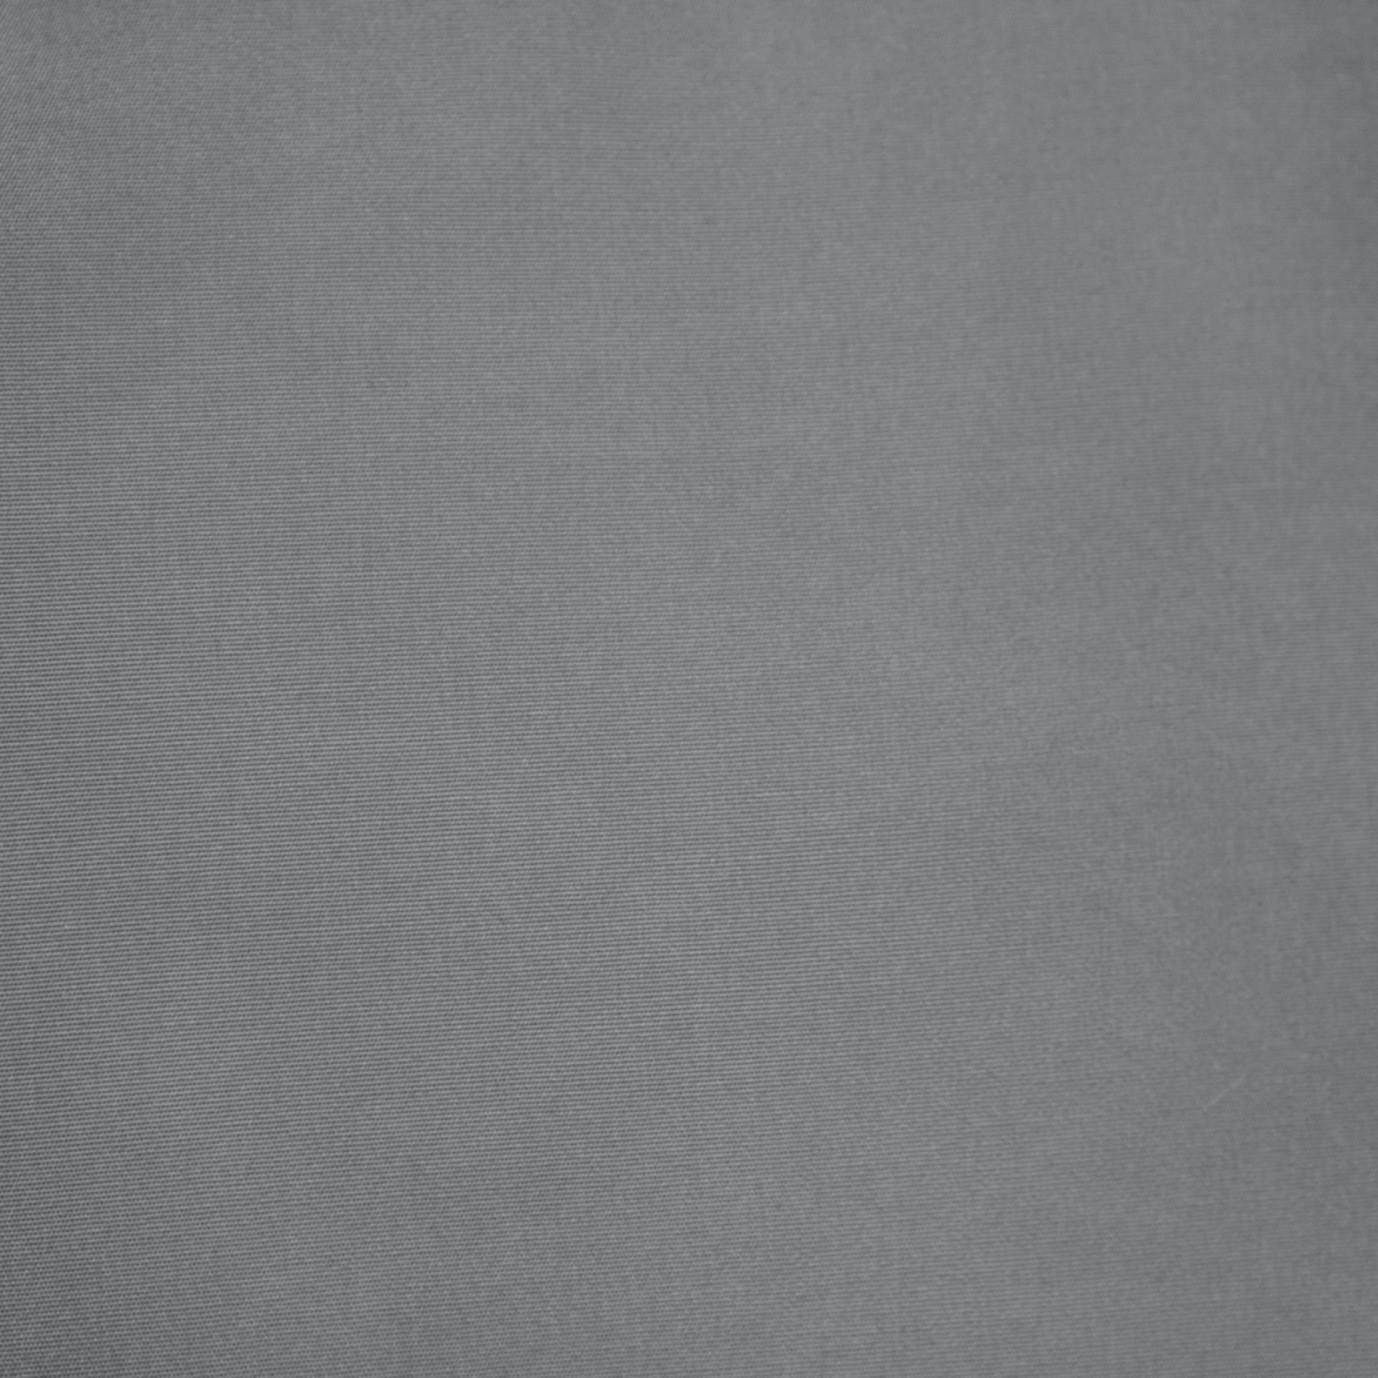 Milo™ Gray Ottomans - Charcoal Gray